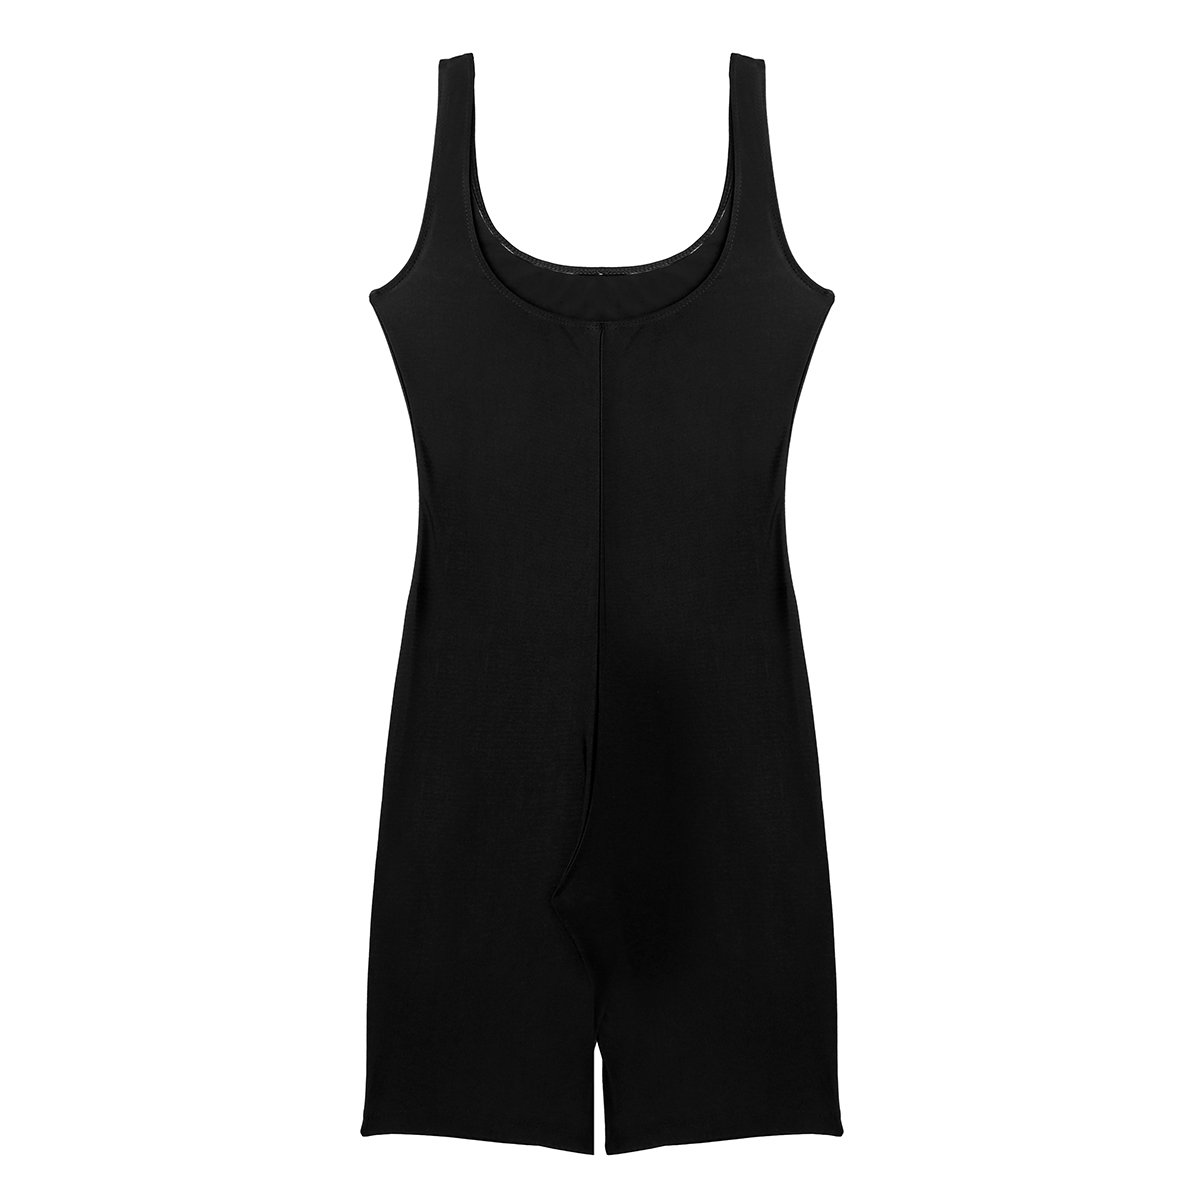 7c7253a39b Amazon.com  FEESHOW Womens Catsuit Stretch Knee Length Active One Piece  Short Yoga Bodysuit Jumpsuit  Clothing